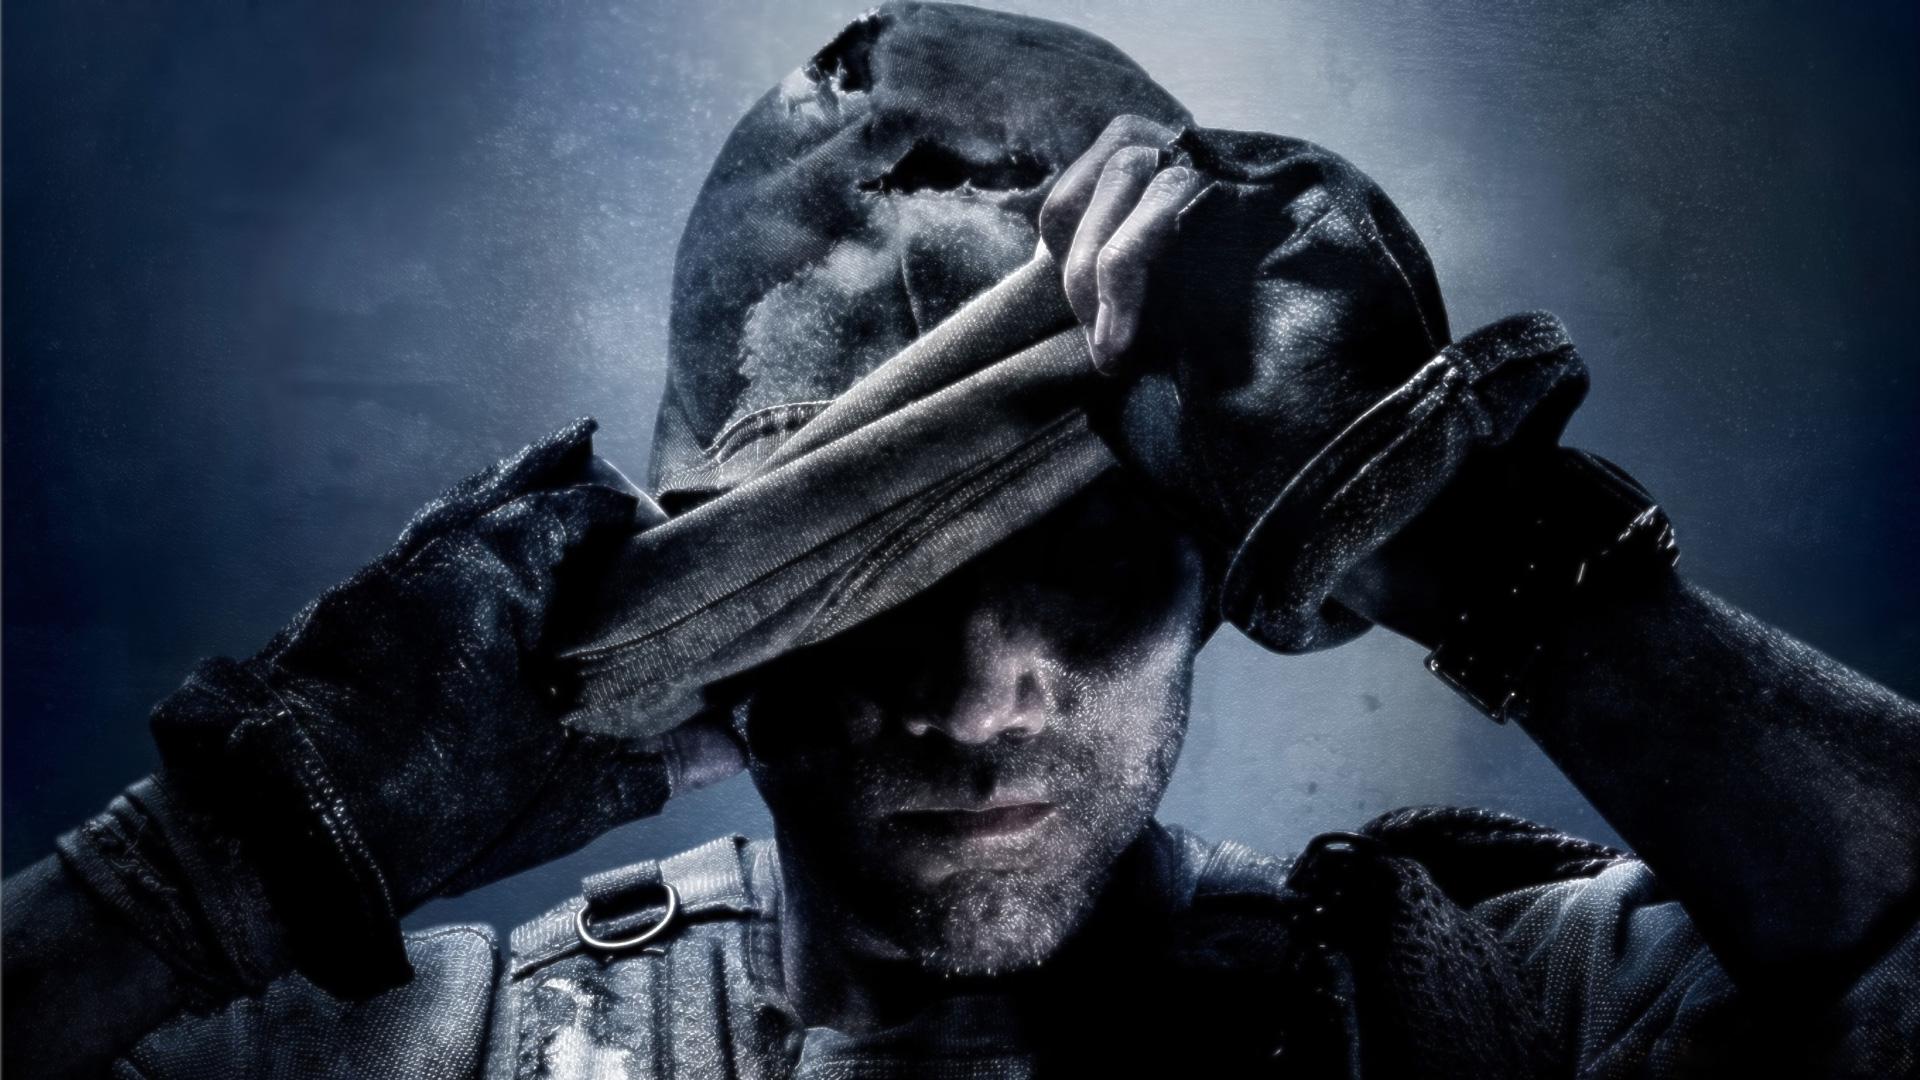 75 Call Of Duty Ghost Wallpaper On Wallpapersafari